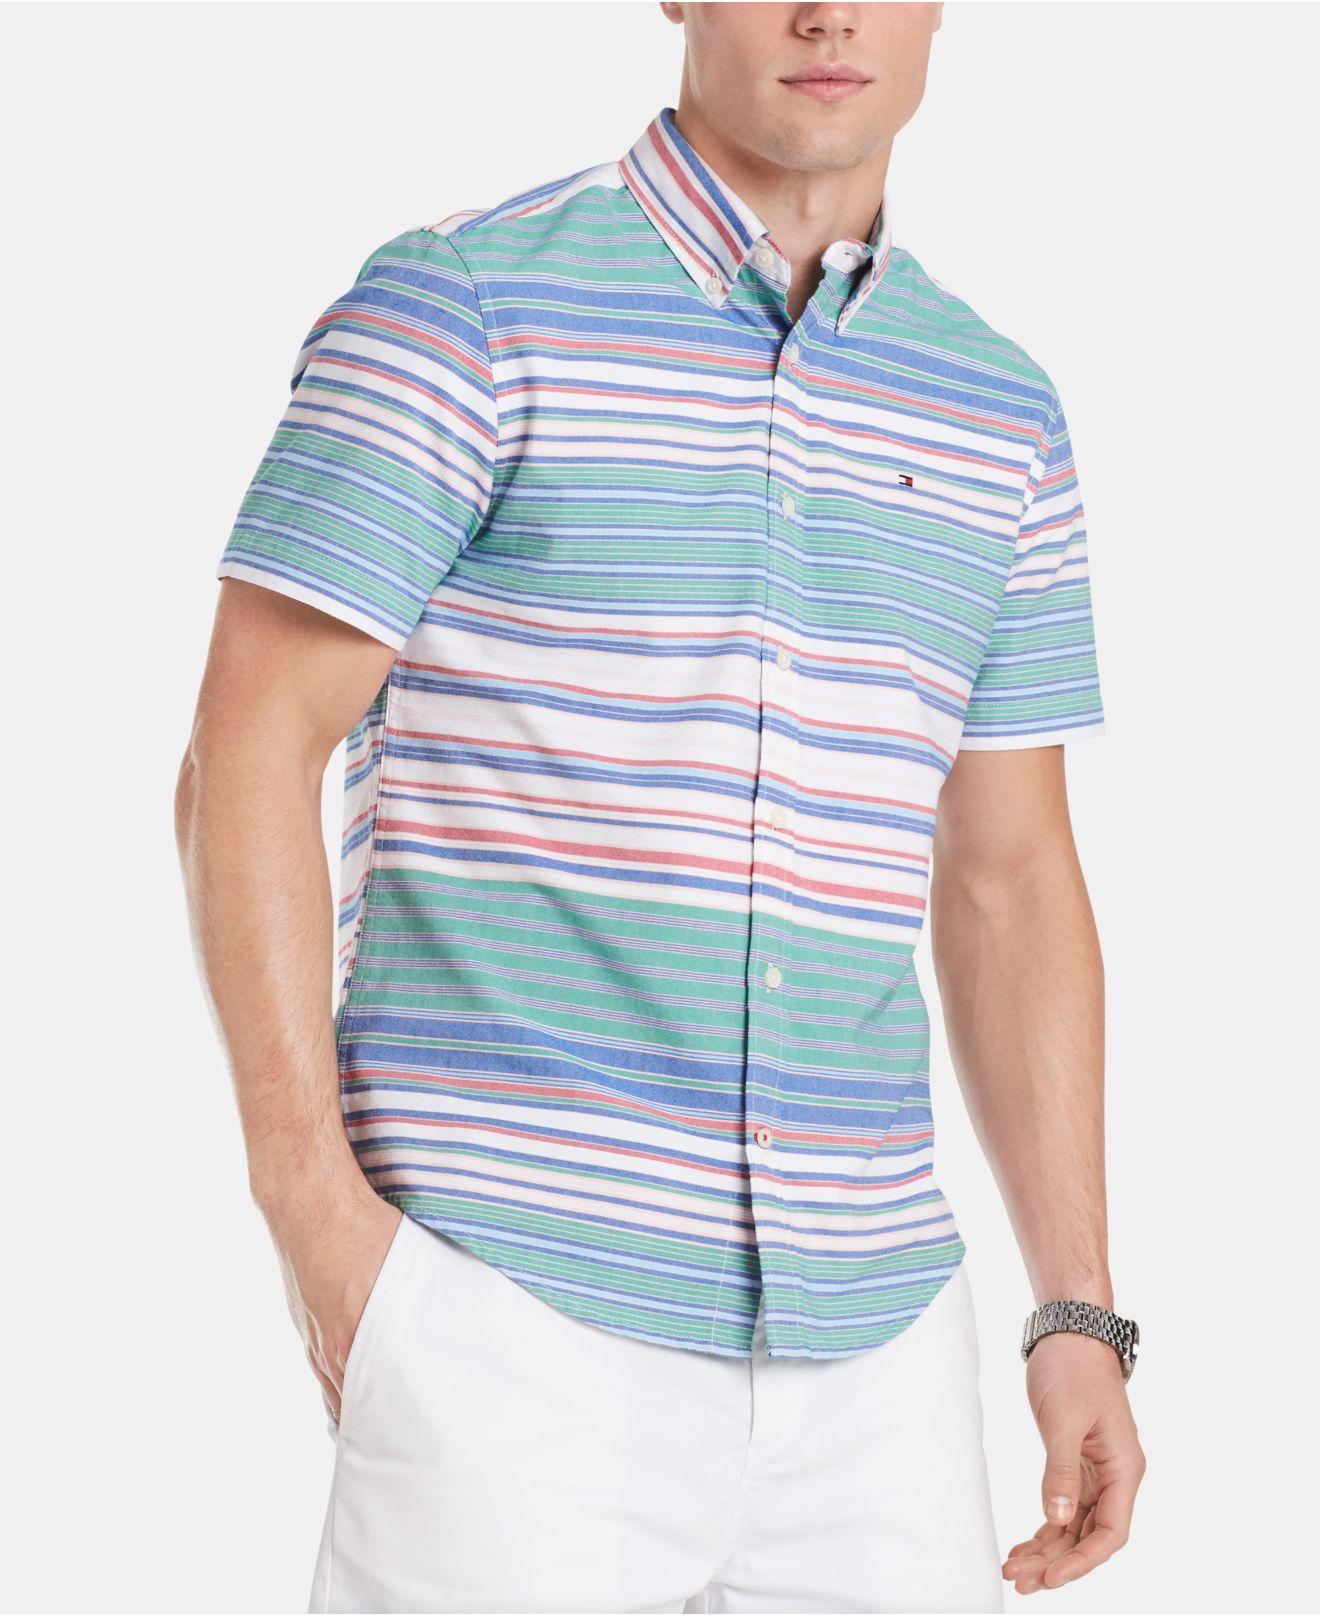 173b8698aa3 Tommy Hilfiger Palmeiri Striped Shirt in Blue for Men - Lyst